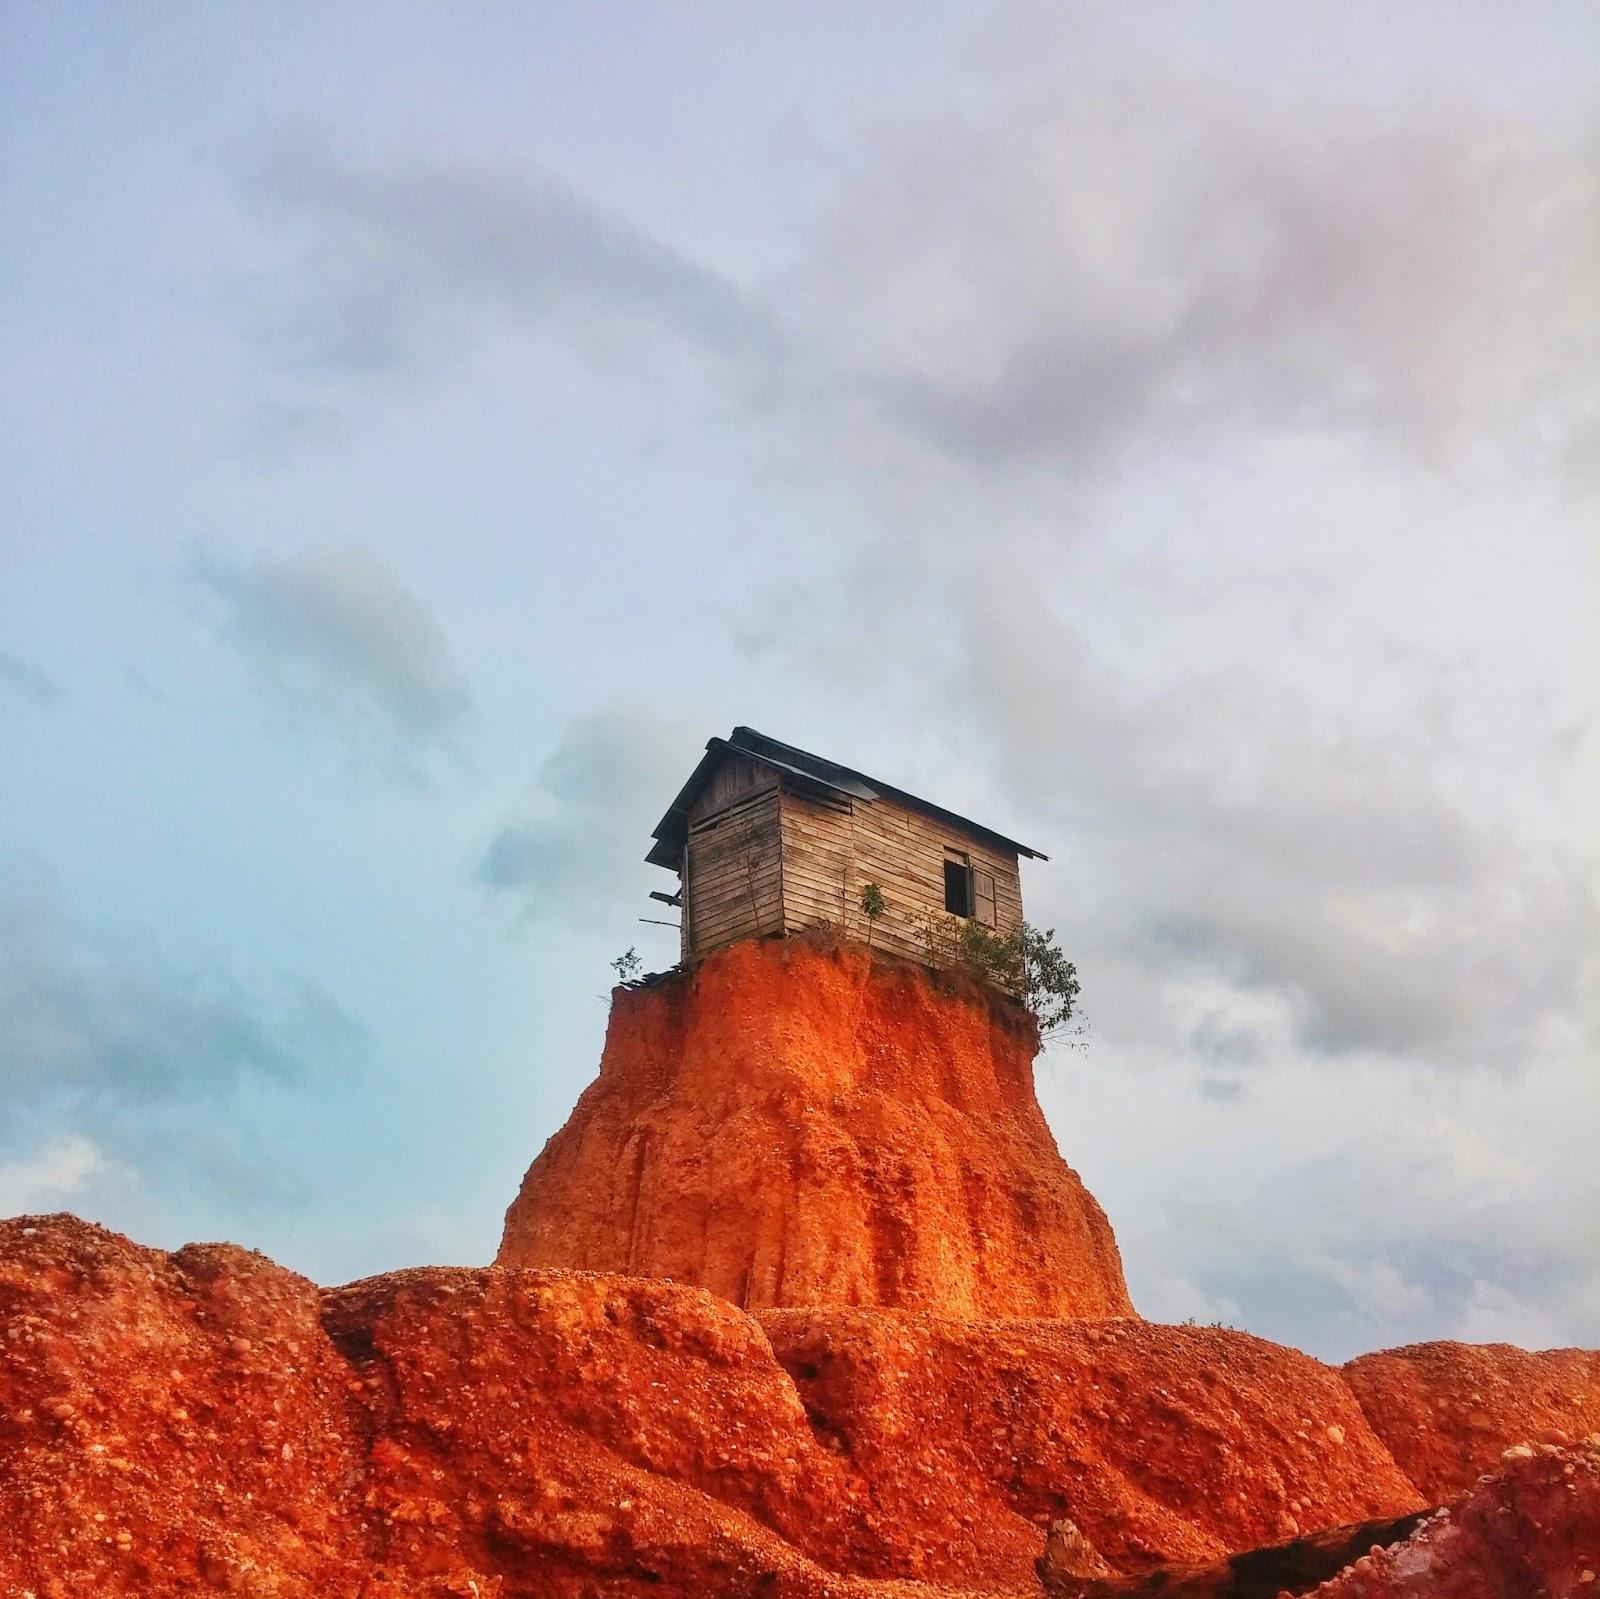 lokasi gunung kupang cempaka banjarbaru